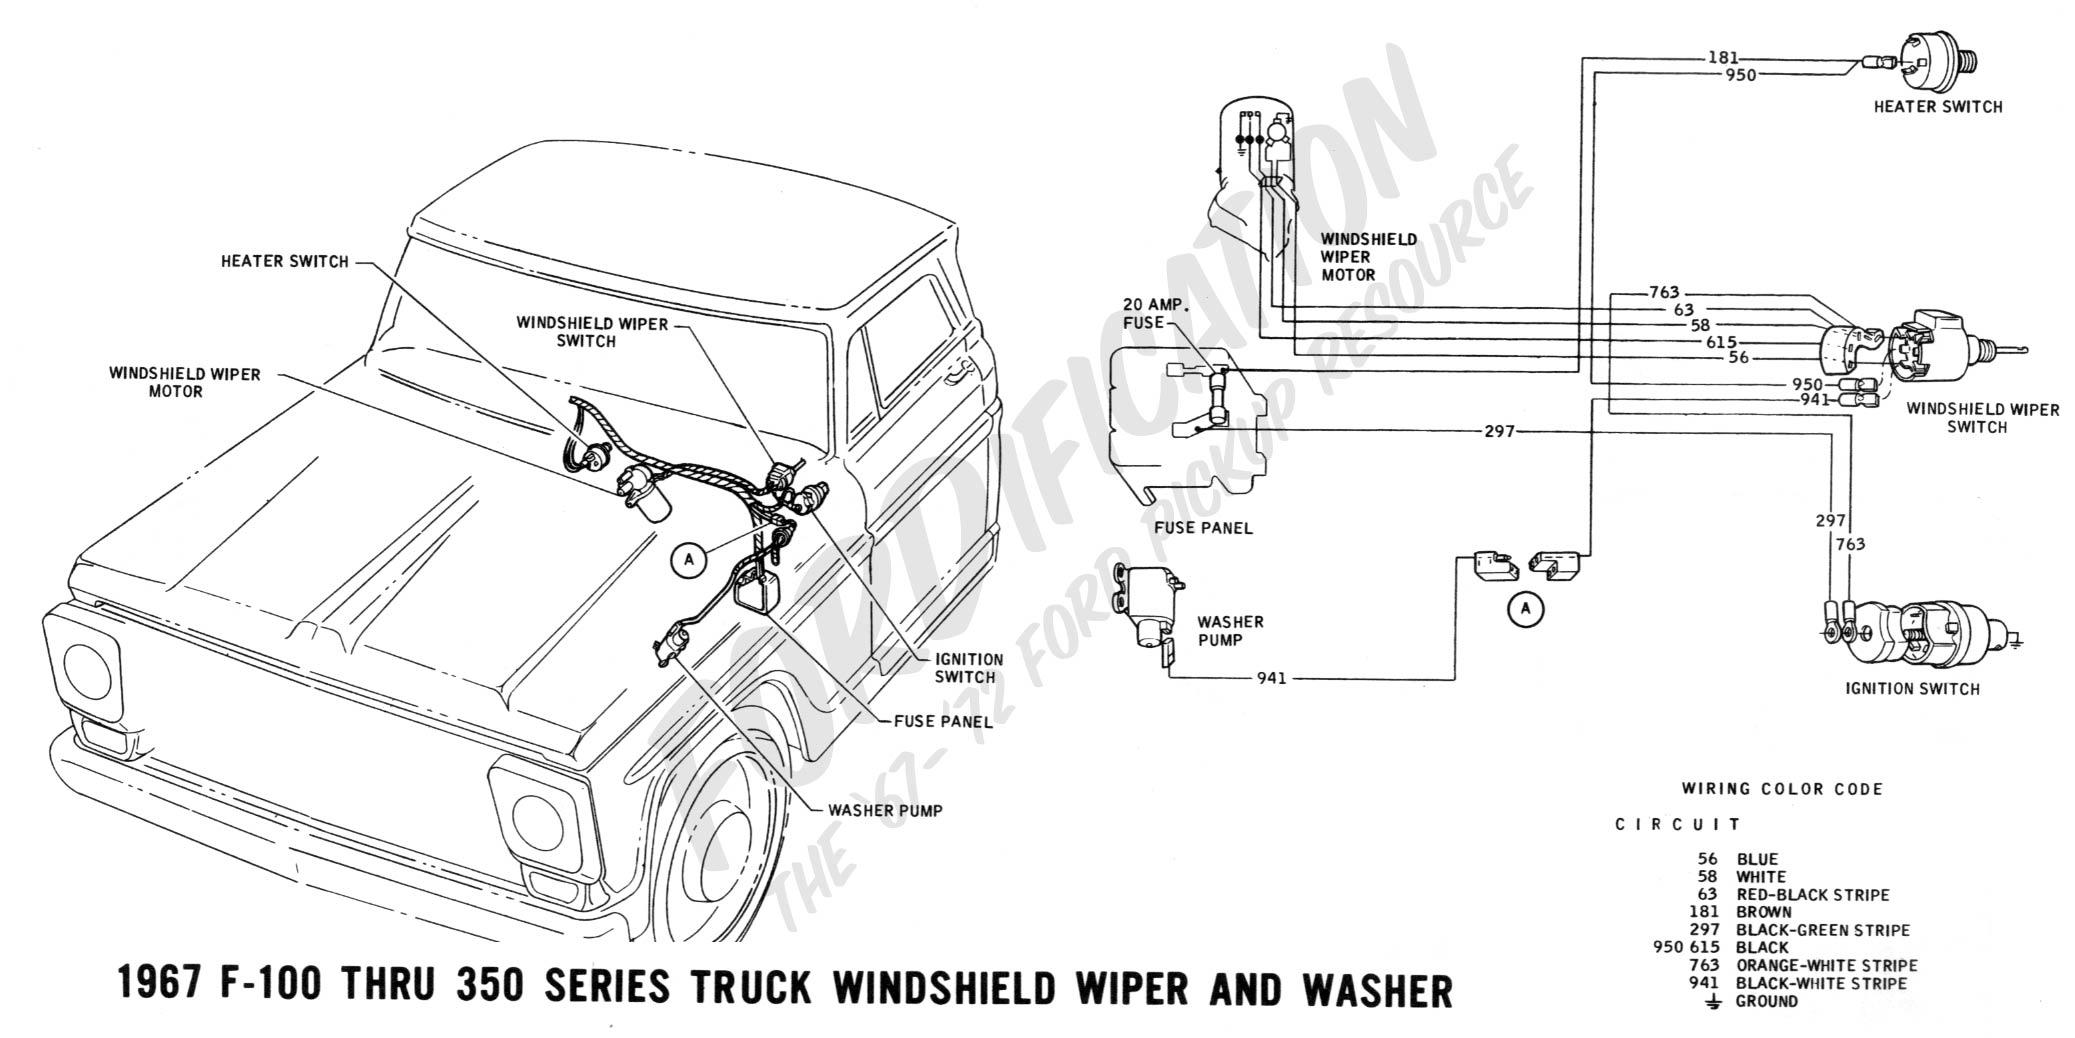 1968 el camino wiper switch wiring diagram